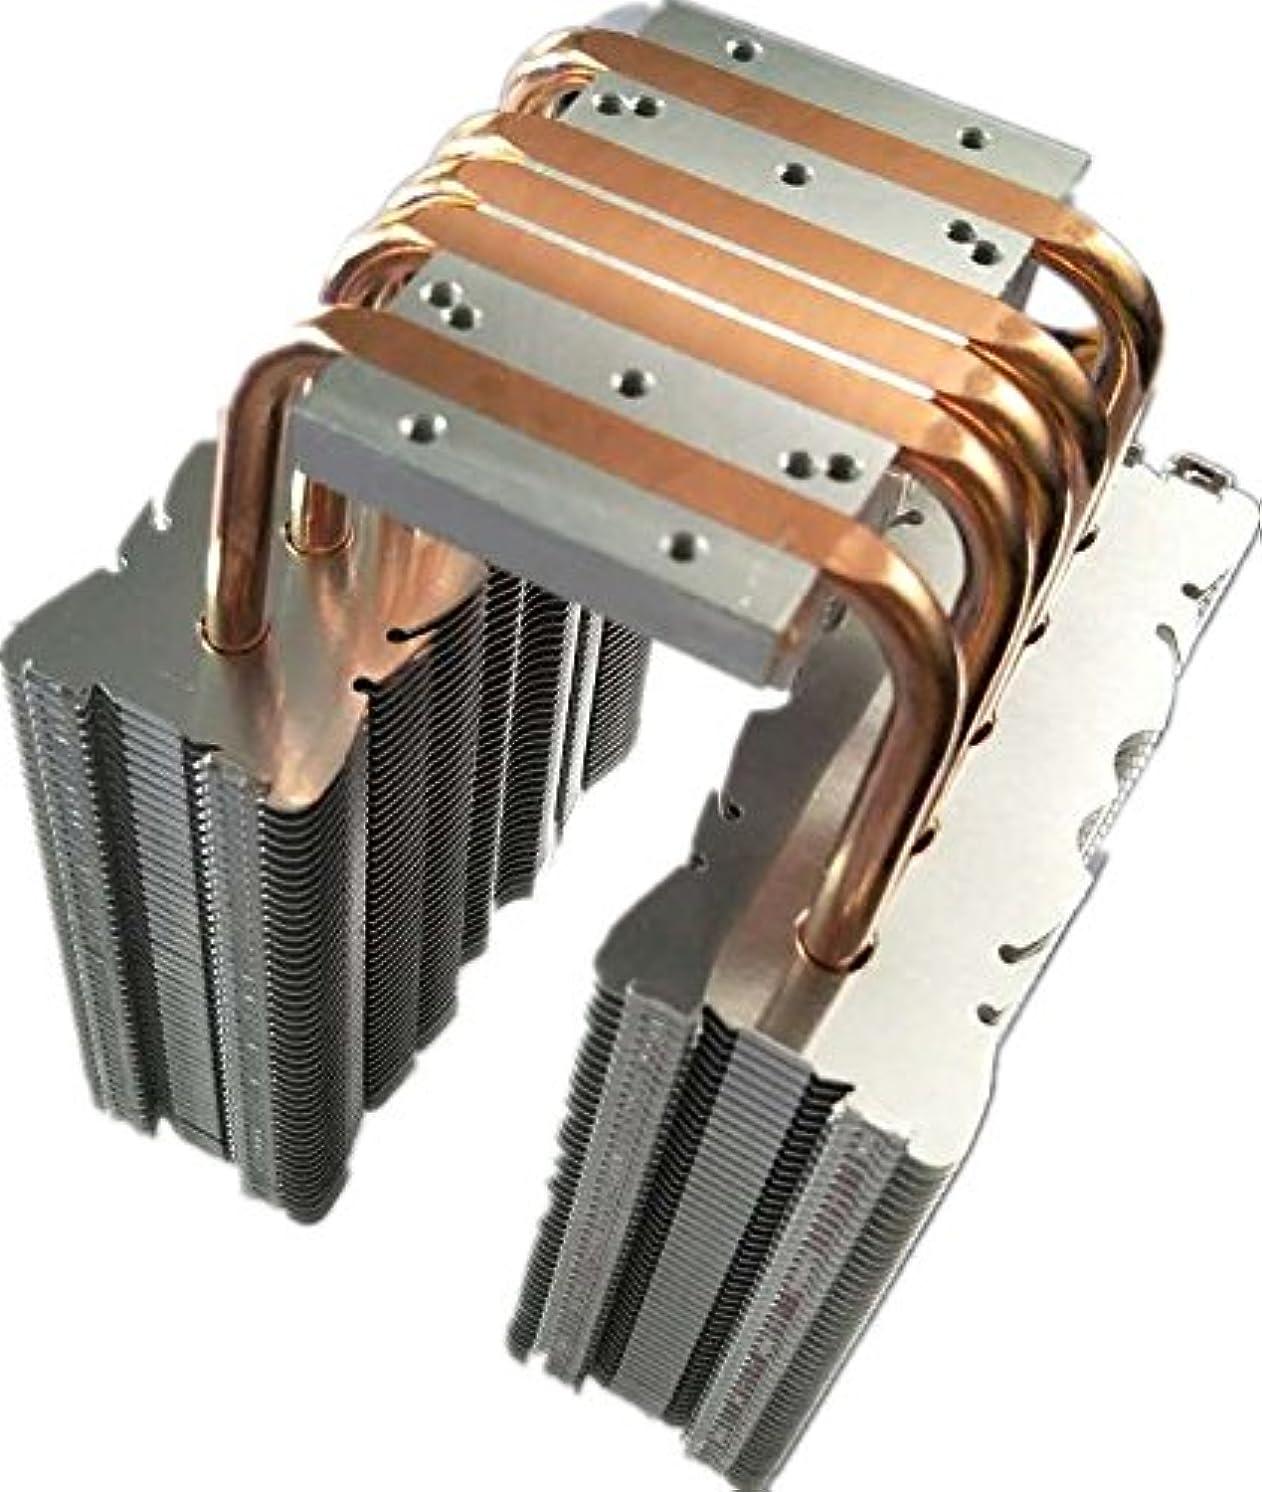 MARSWALLED Excellent Copper & Aluminum Heatpipe Dual Radiator Cooling Heatsink for 200W COB LED or DIY CPU Cooler/VGA Card